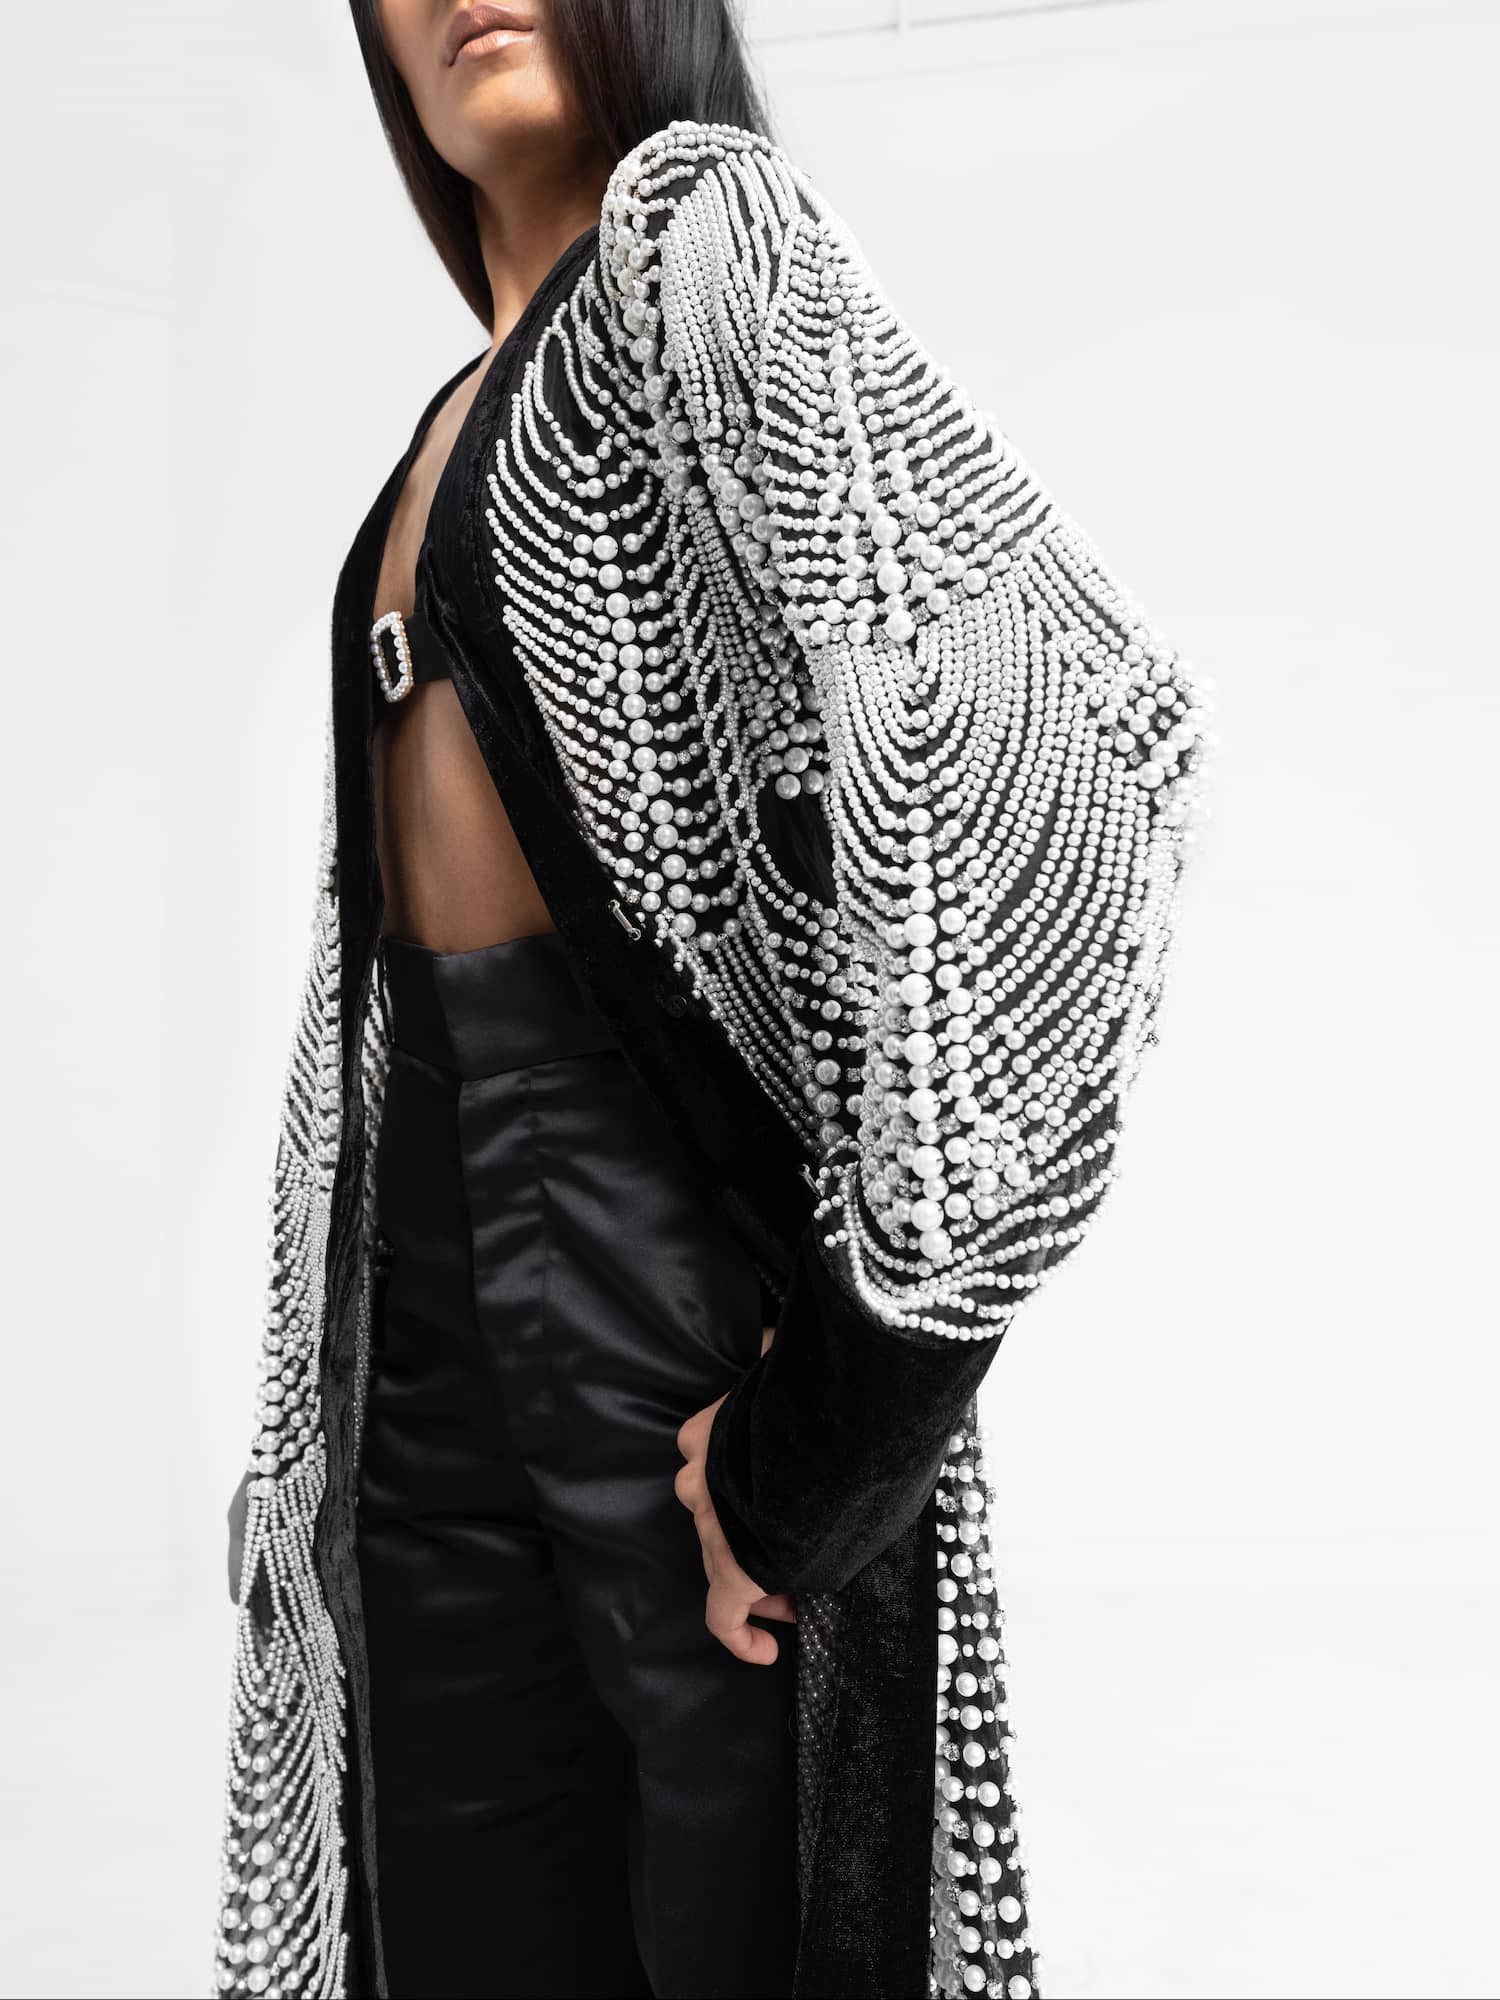 View 2 of model wearing Khhatak Kimono top in black.